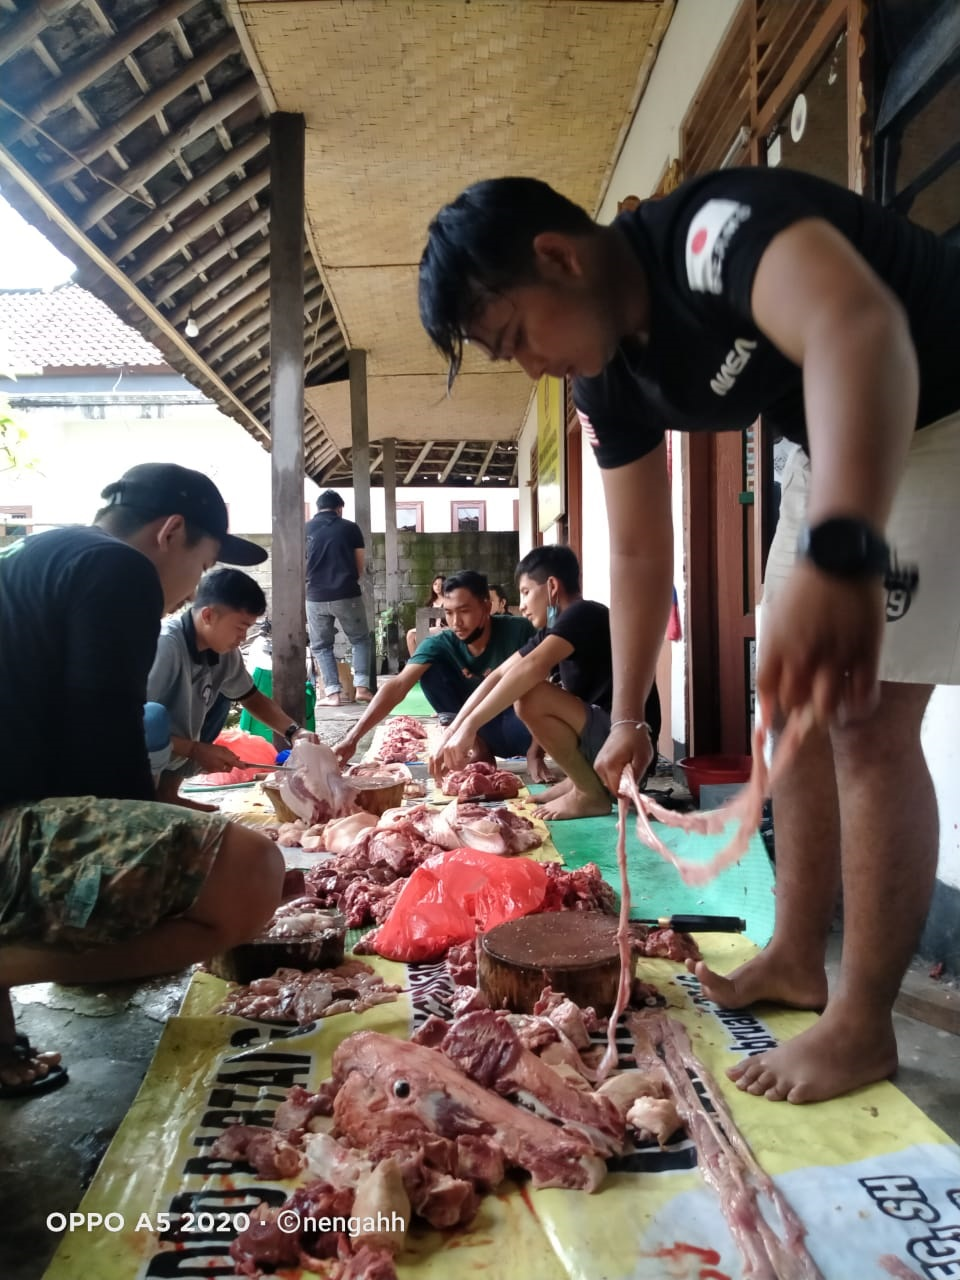 KEGIATAN pemotongan babi yang dilakukan Peradah Karangasem untuk selanjutnya dibagikan kepada warga kurang mampu, Minggu (11/4/2021), menyambut perayaan Galungan. Foto: nad